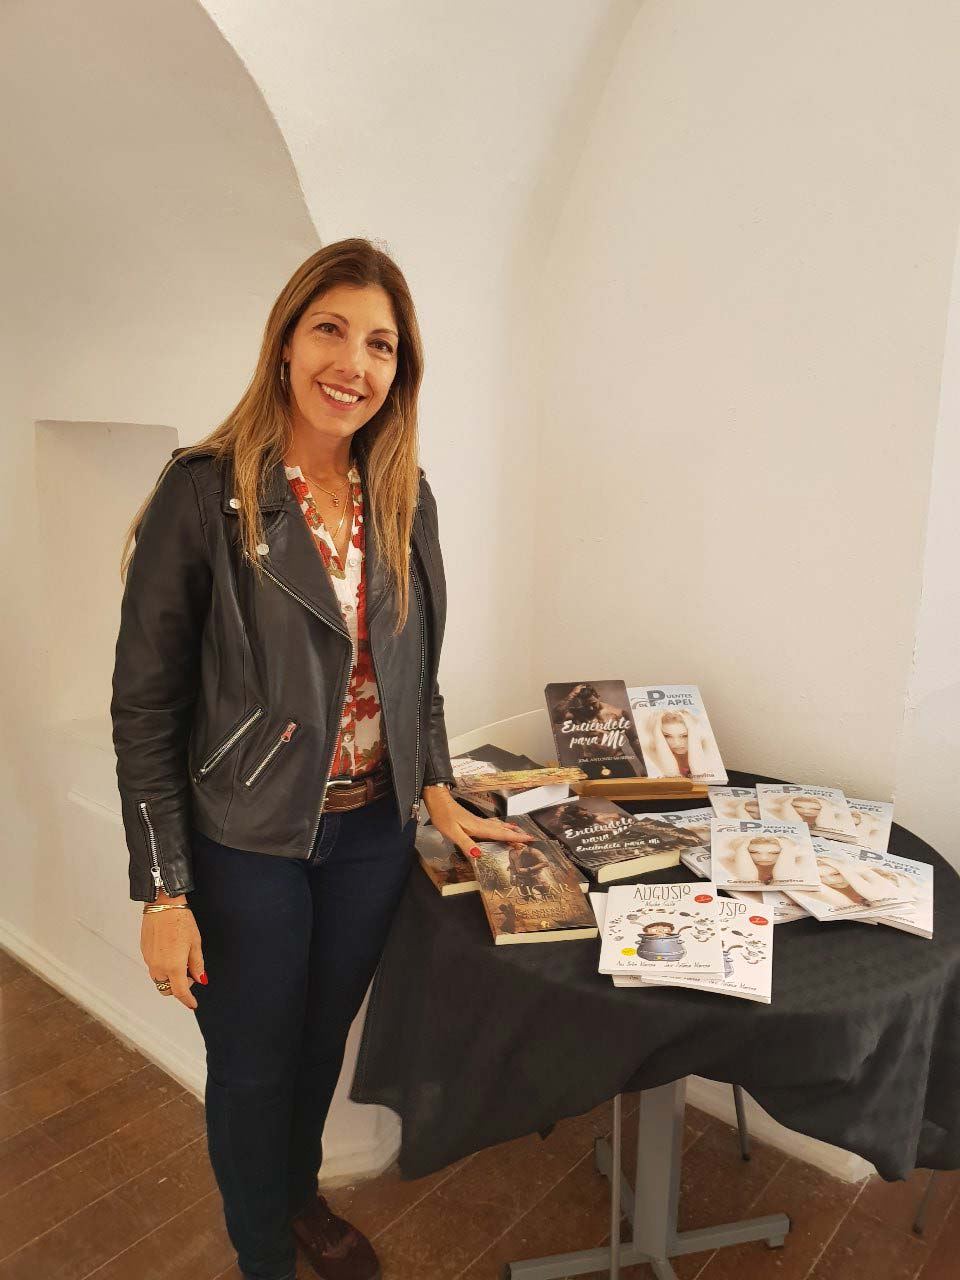 Presentacion-Puentes-de-papel-feria-del-libro-Pto.-Sta-Maria-Cadiz